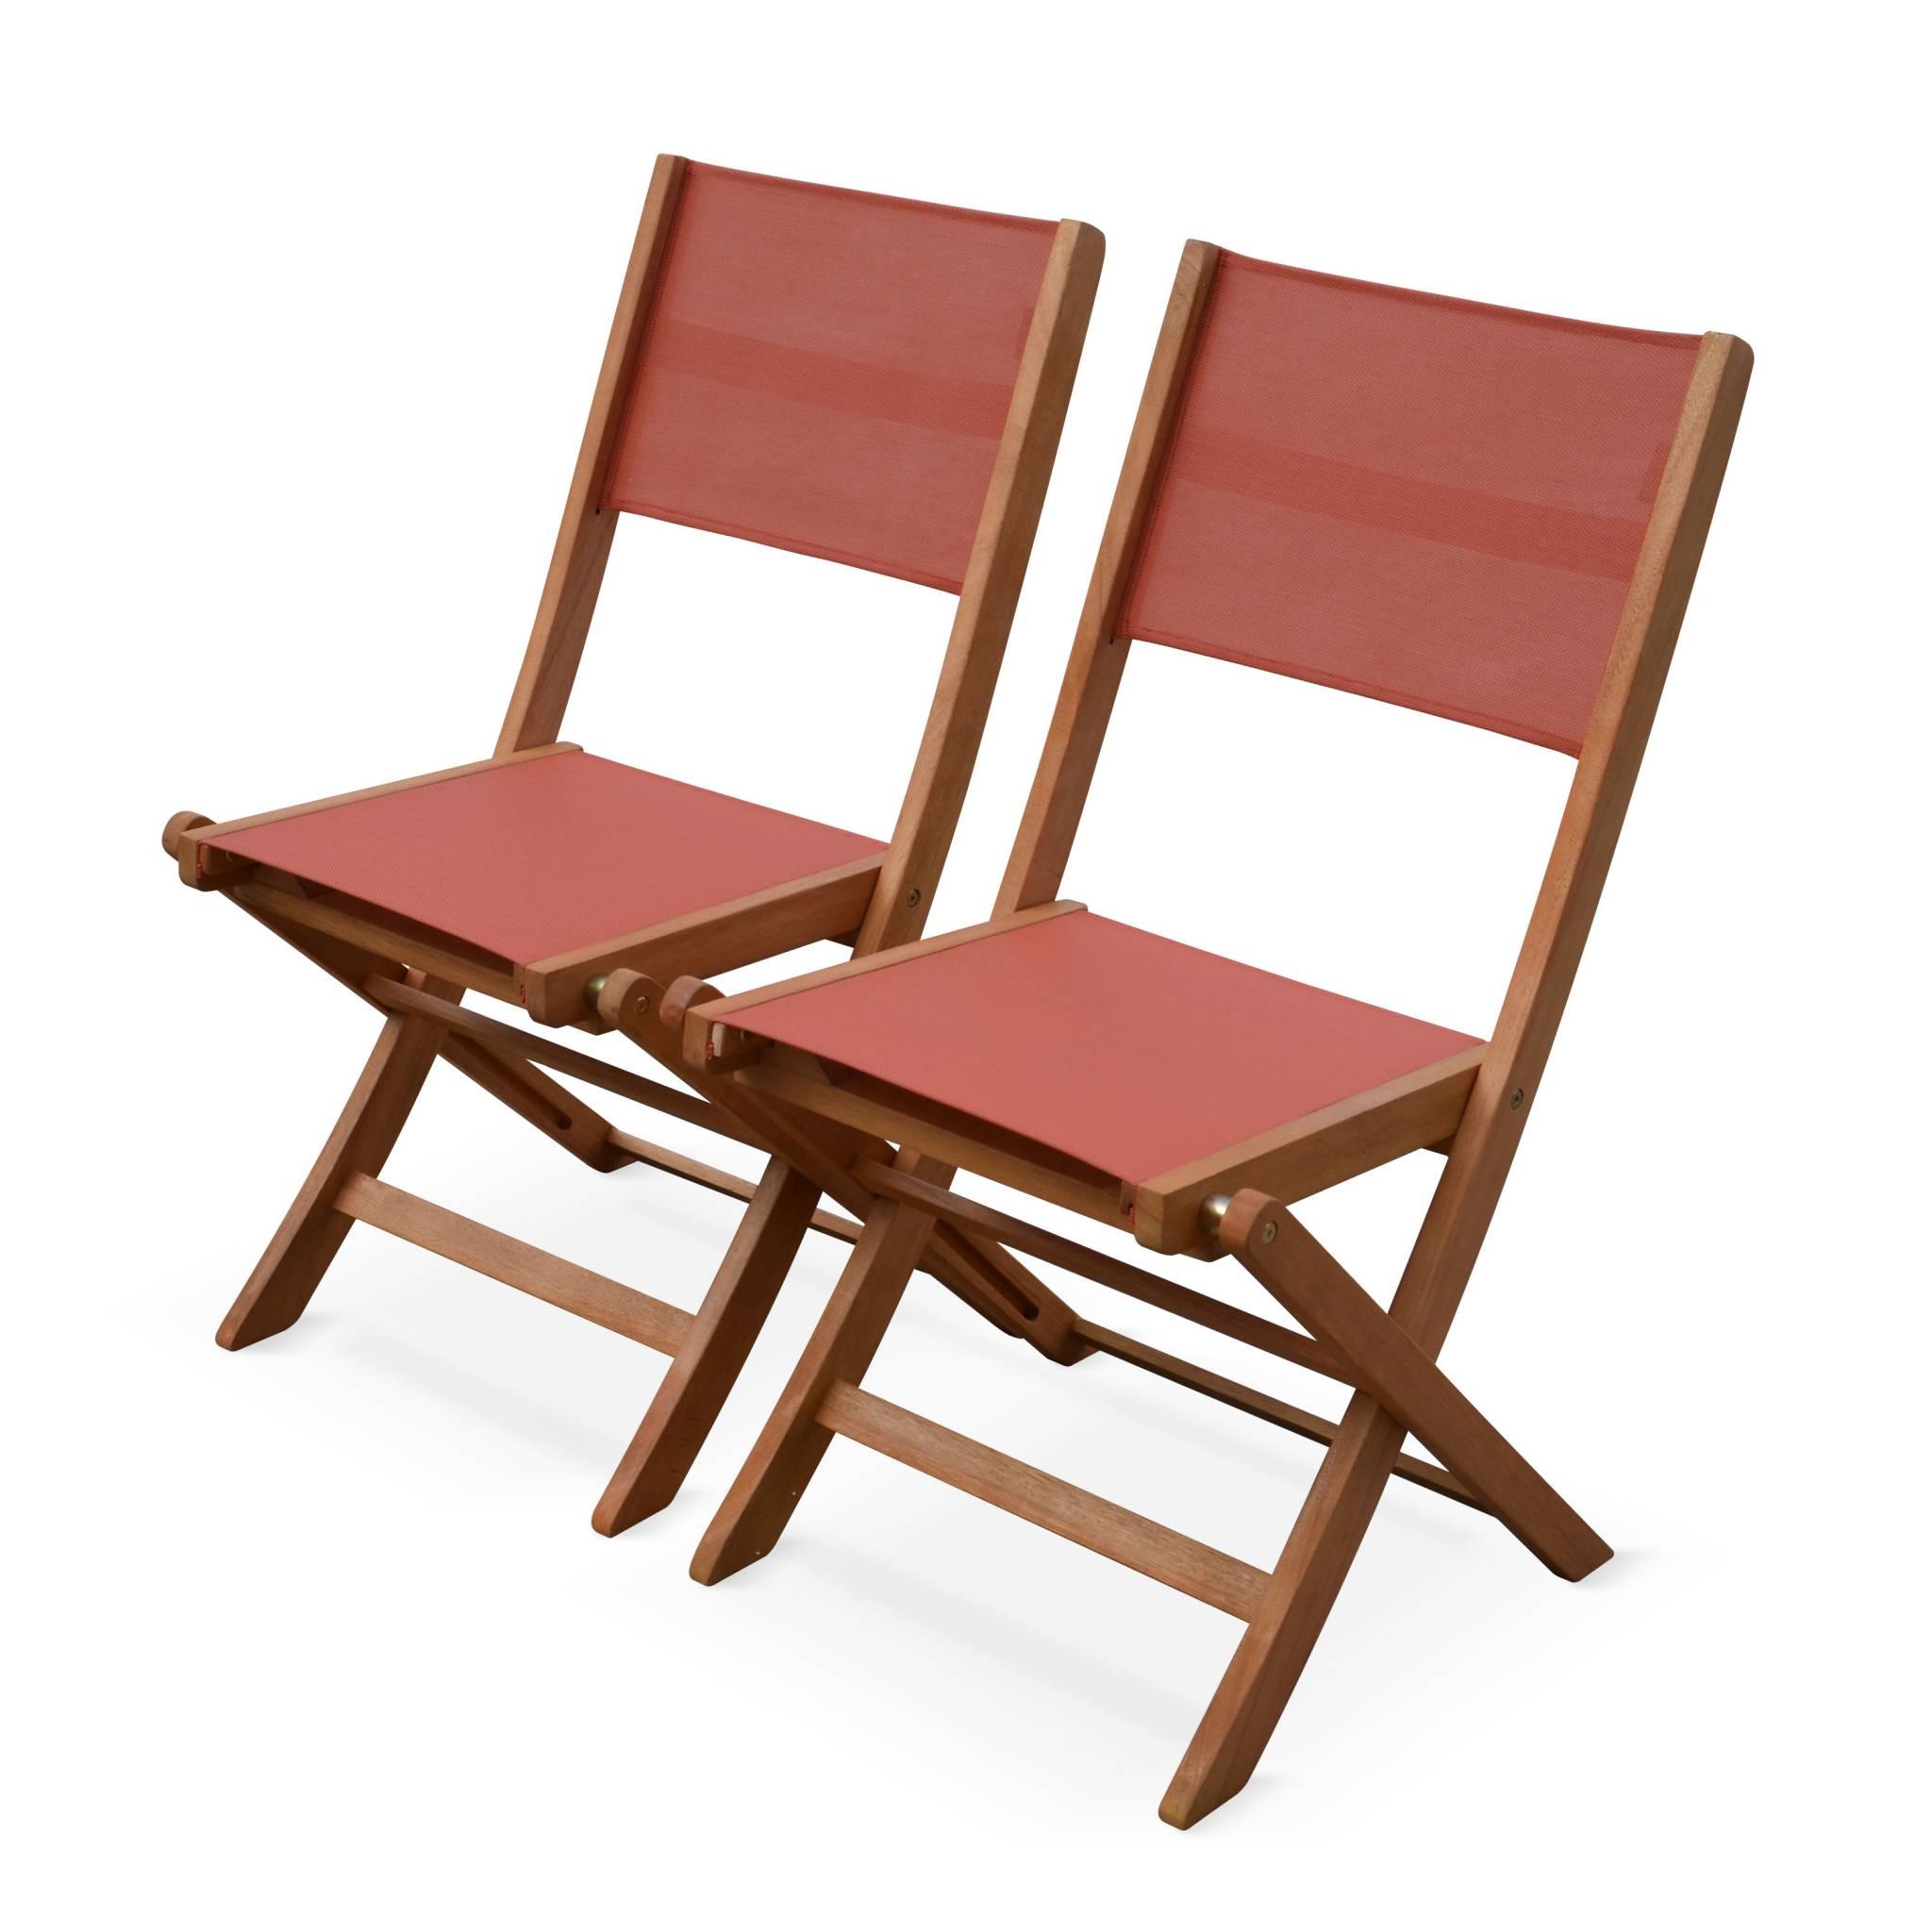 Lot de 2 chaises de jardin en bois terracotta